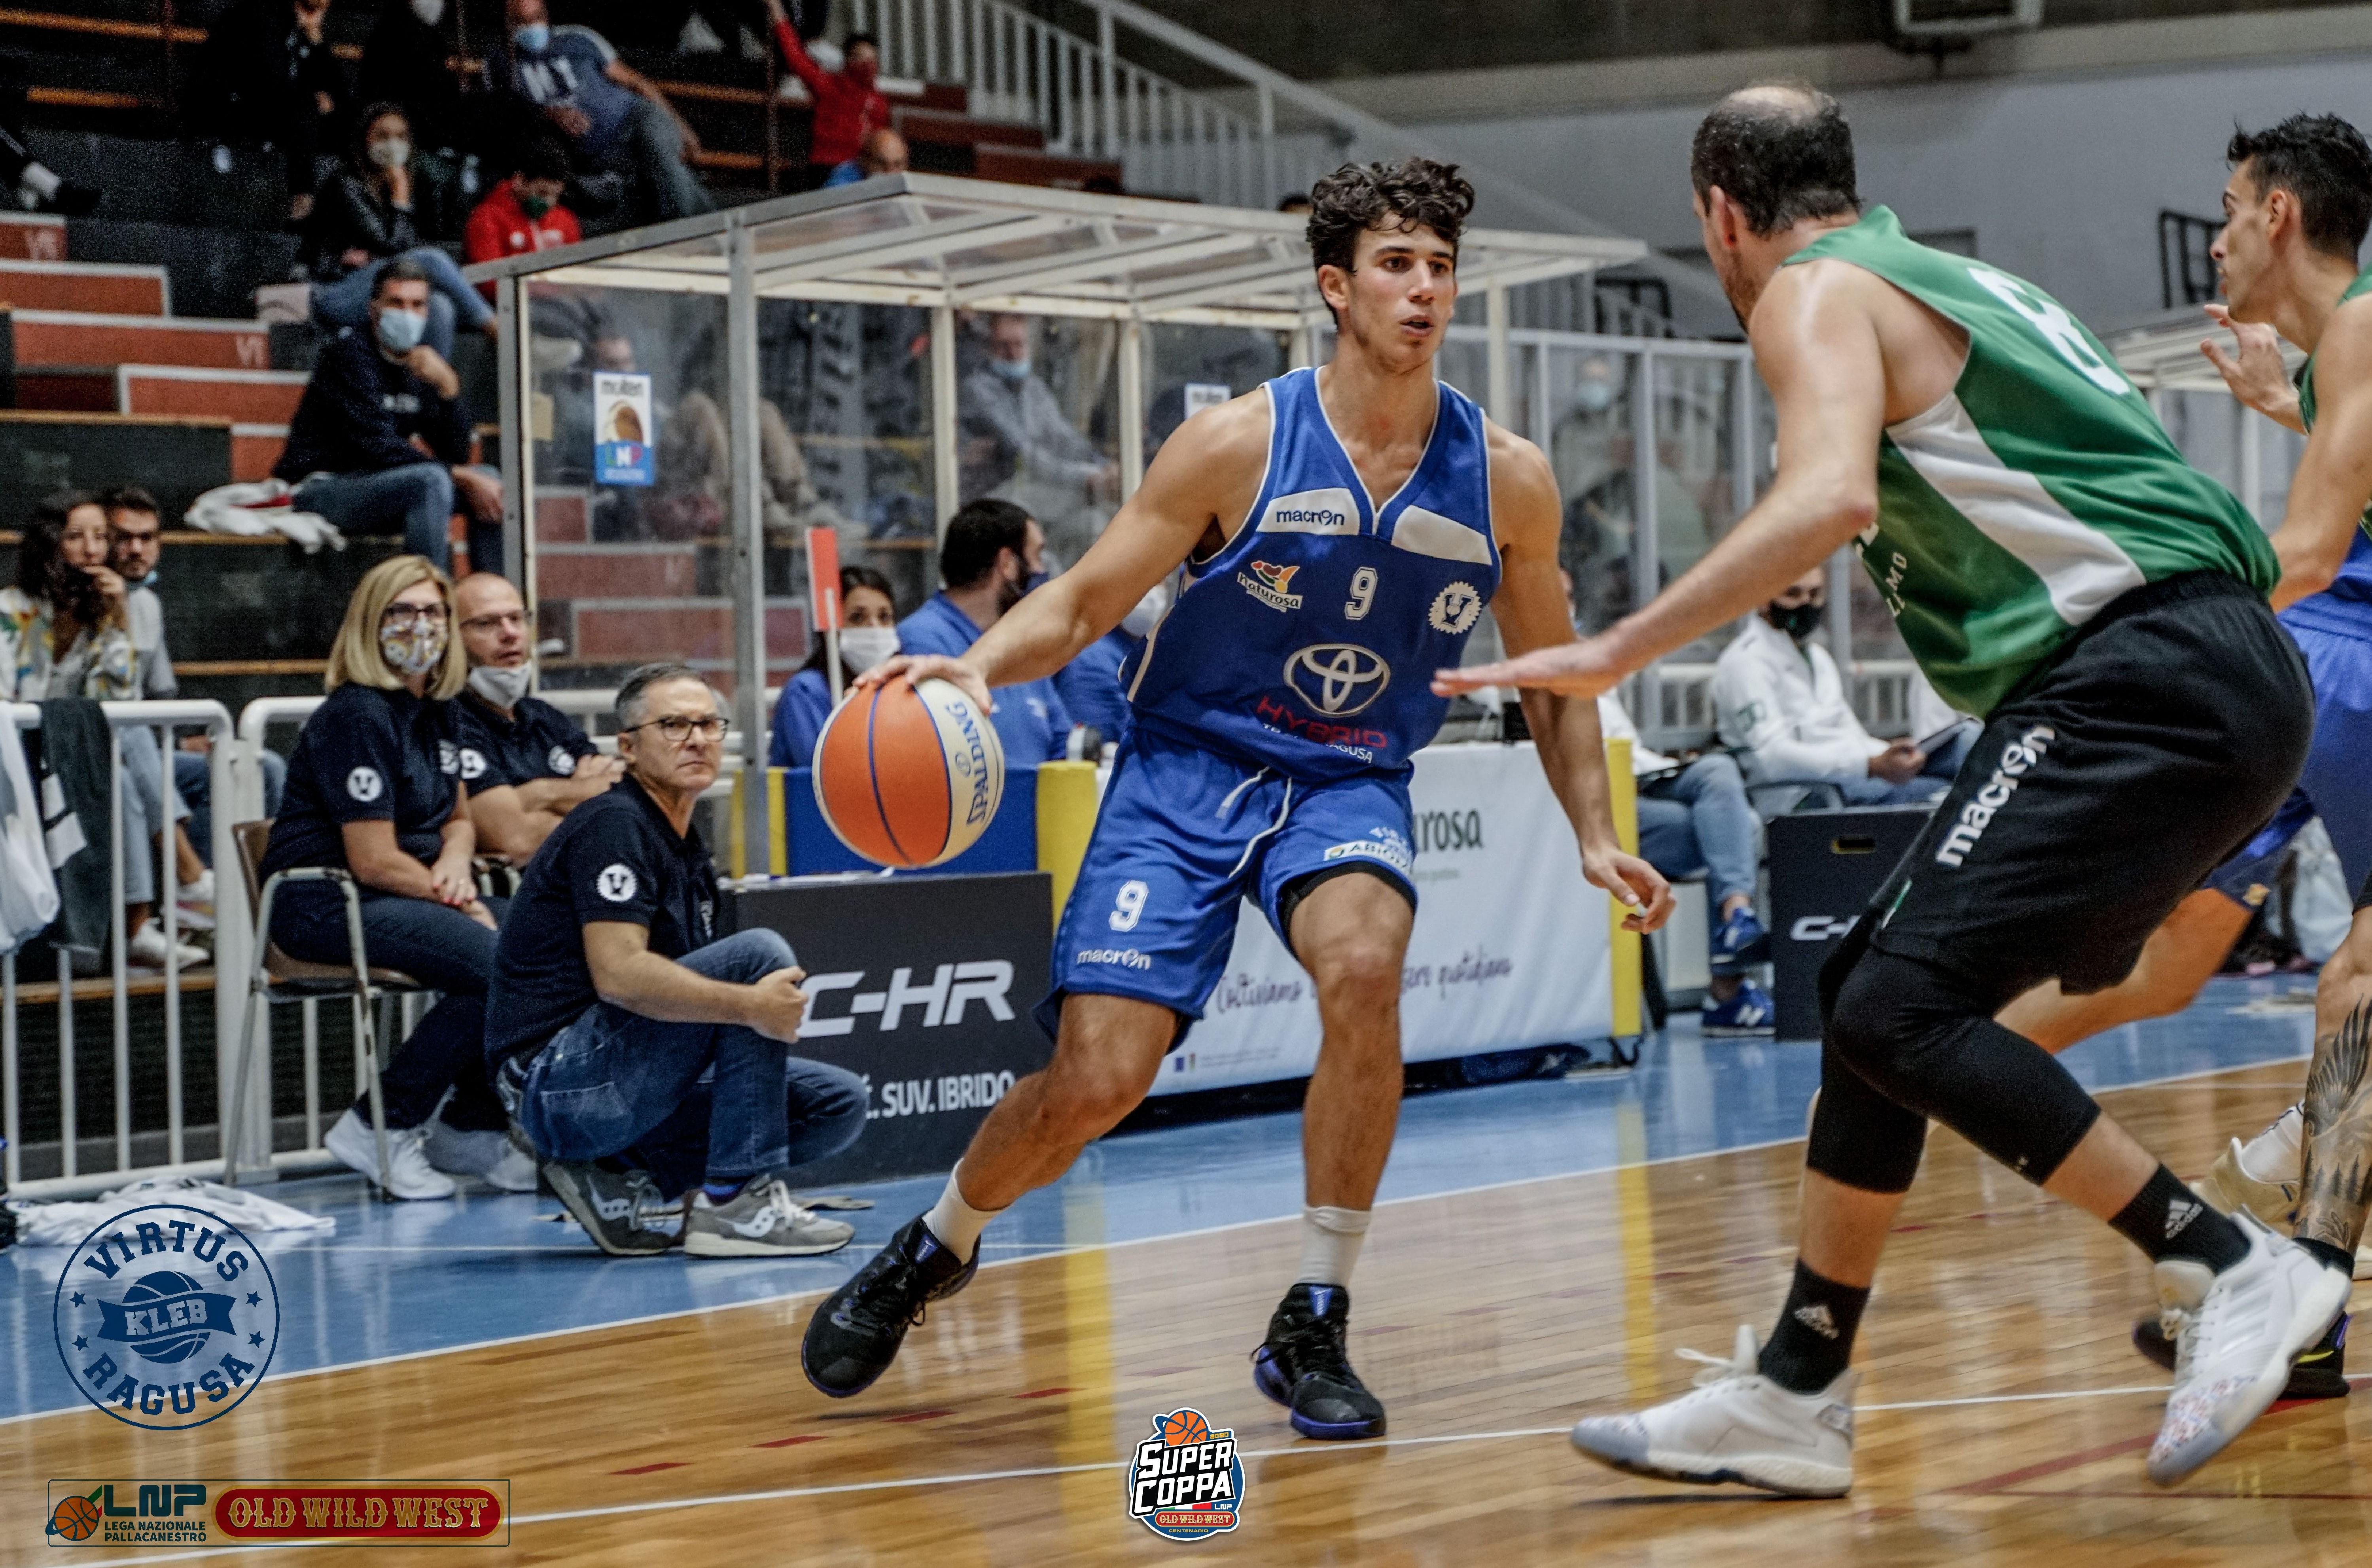 Basket, Supercoppa: la Virtus Kleb Ragusa battuta dal Palermo nei secondi finali